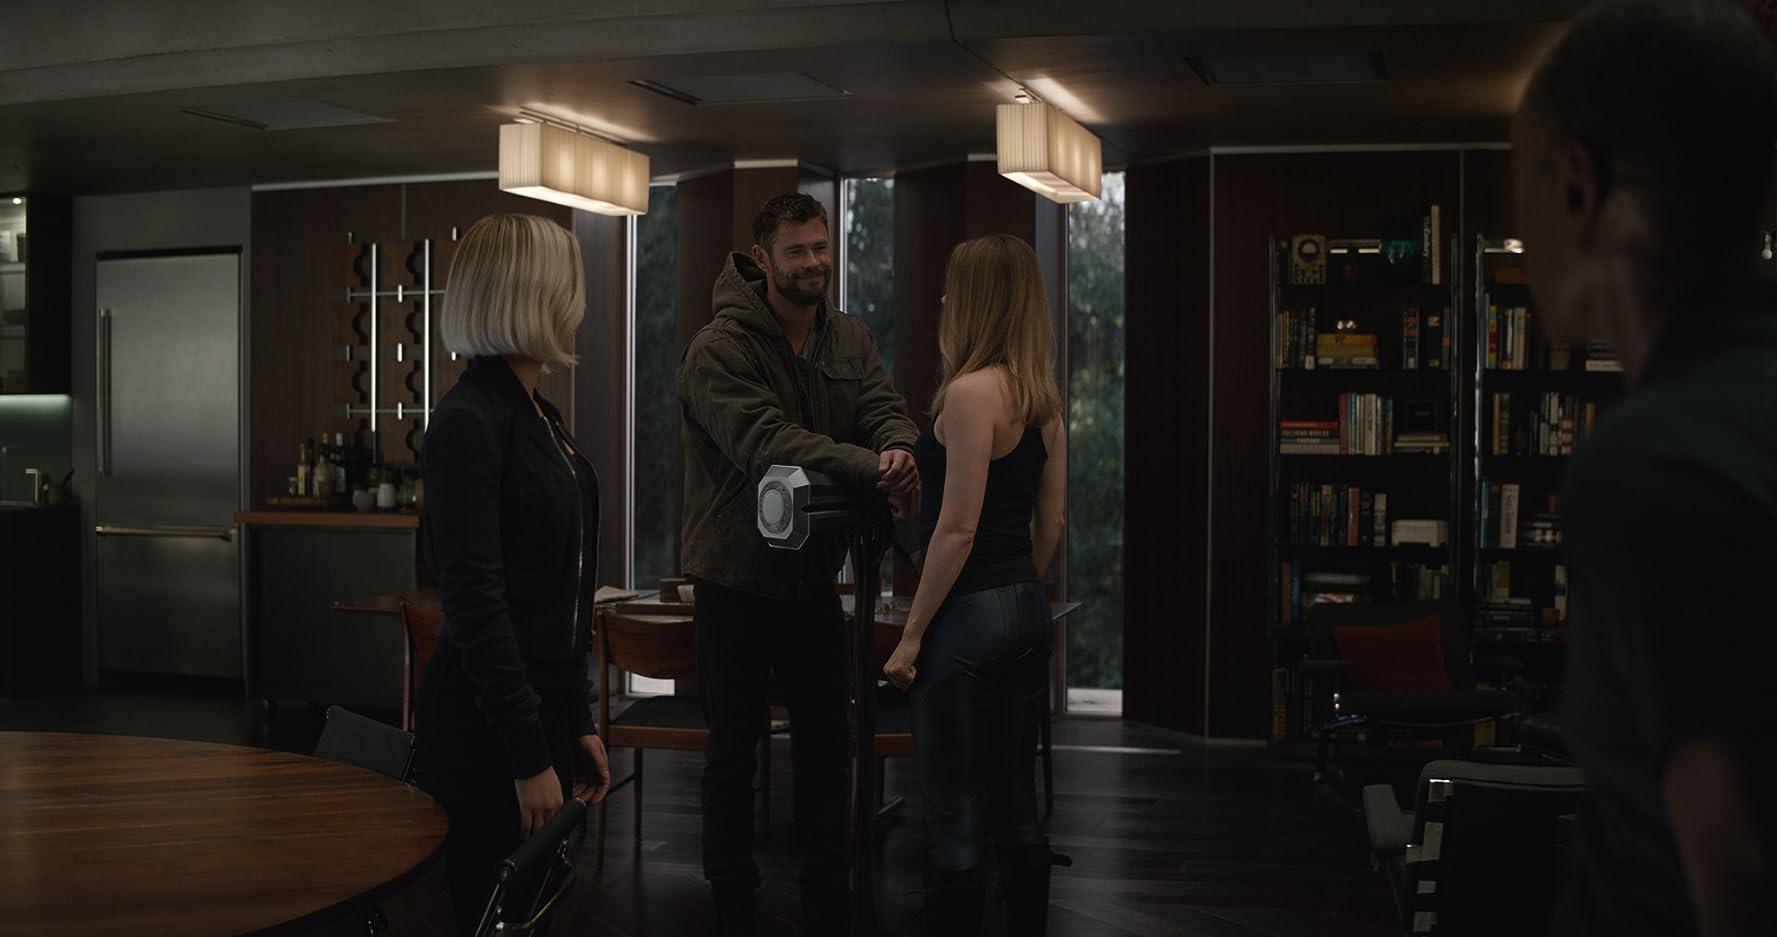 Thor, Captain Marvel, Natasha Romanoff, Avengers: Endgame.